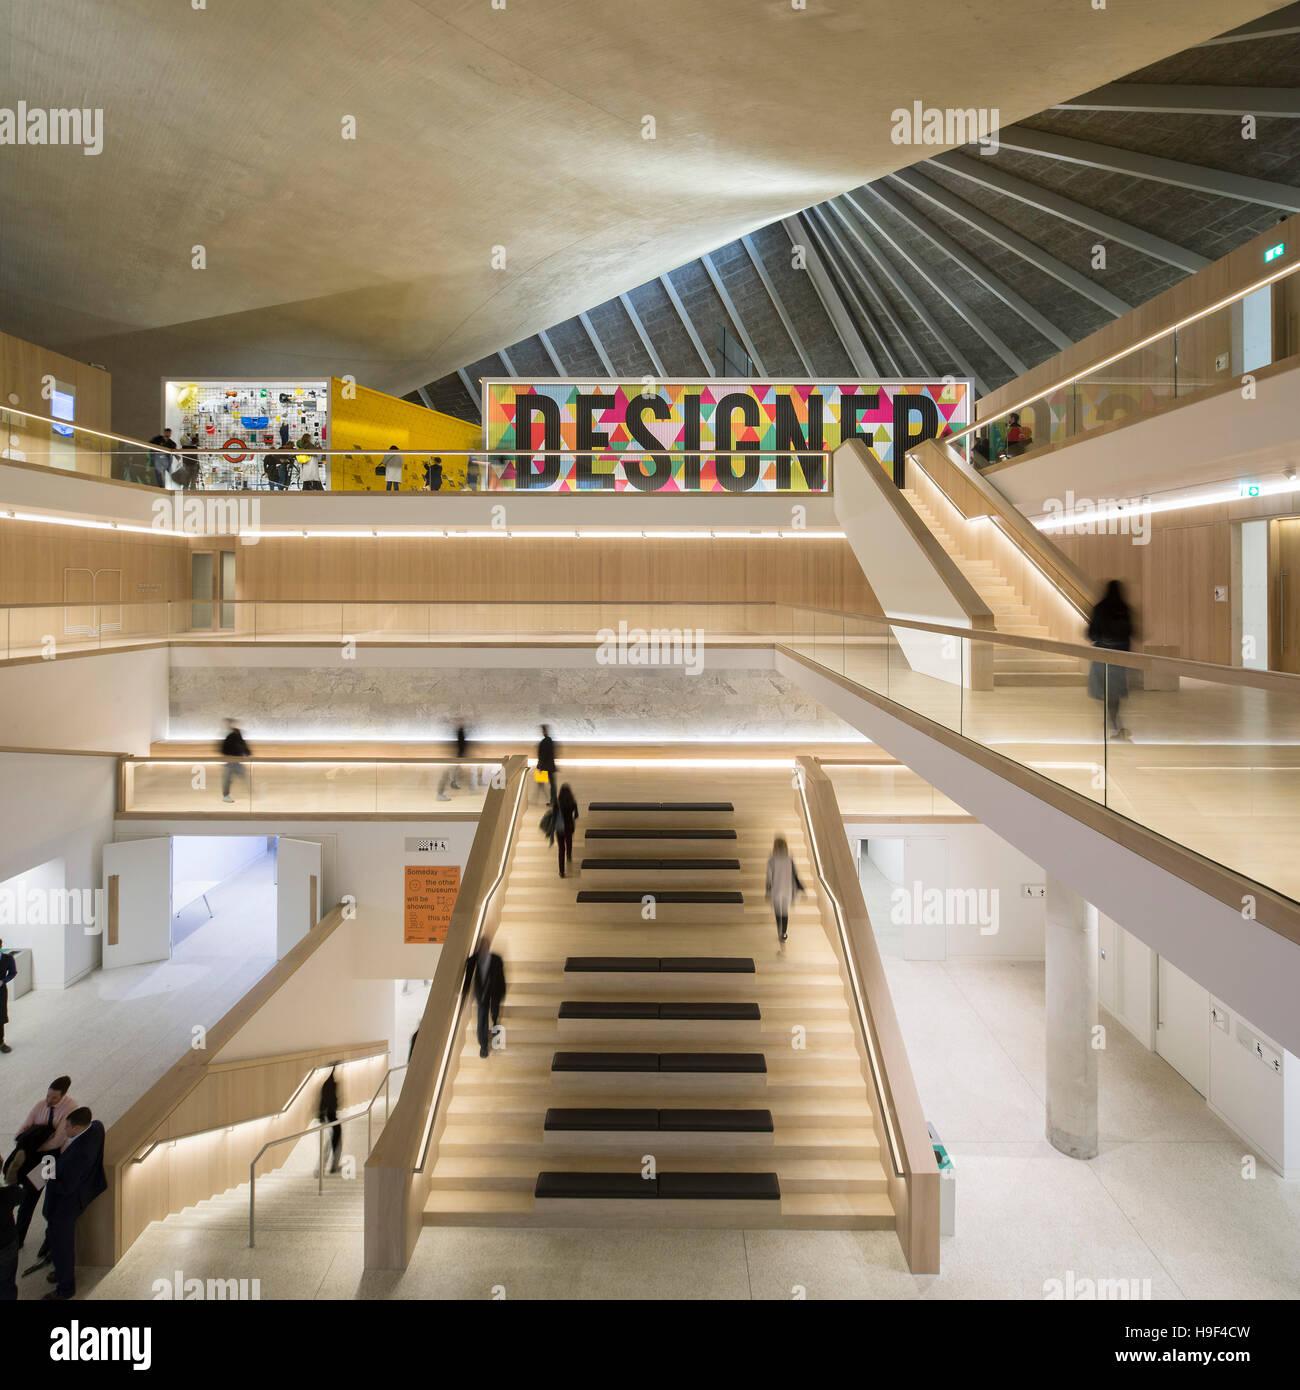 interior view of atrium design museum london united kingdom stock photo 126337257 alamy. Black Bedroom Furniture Sets. Home Design Ideas